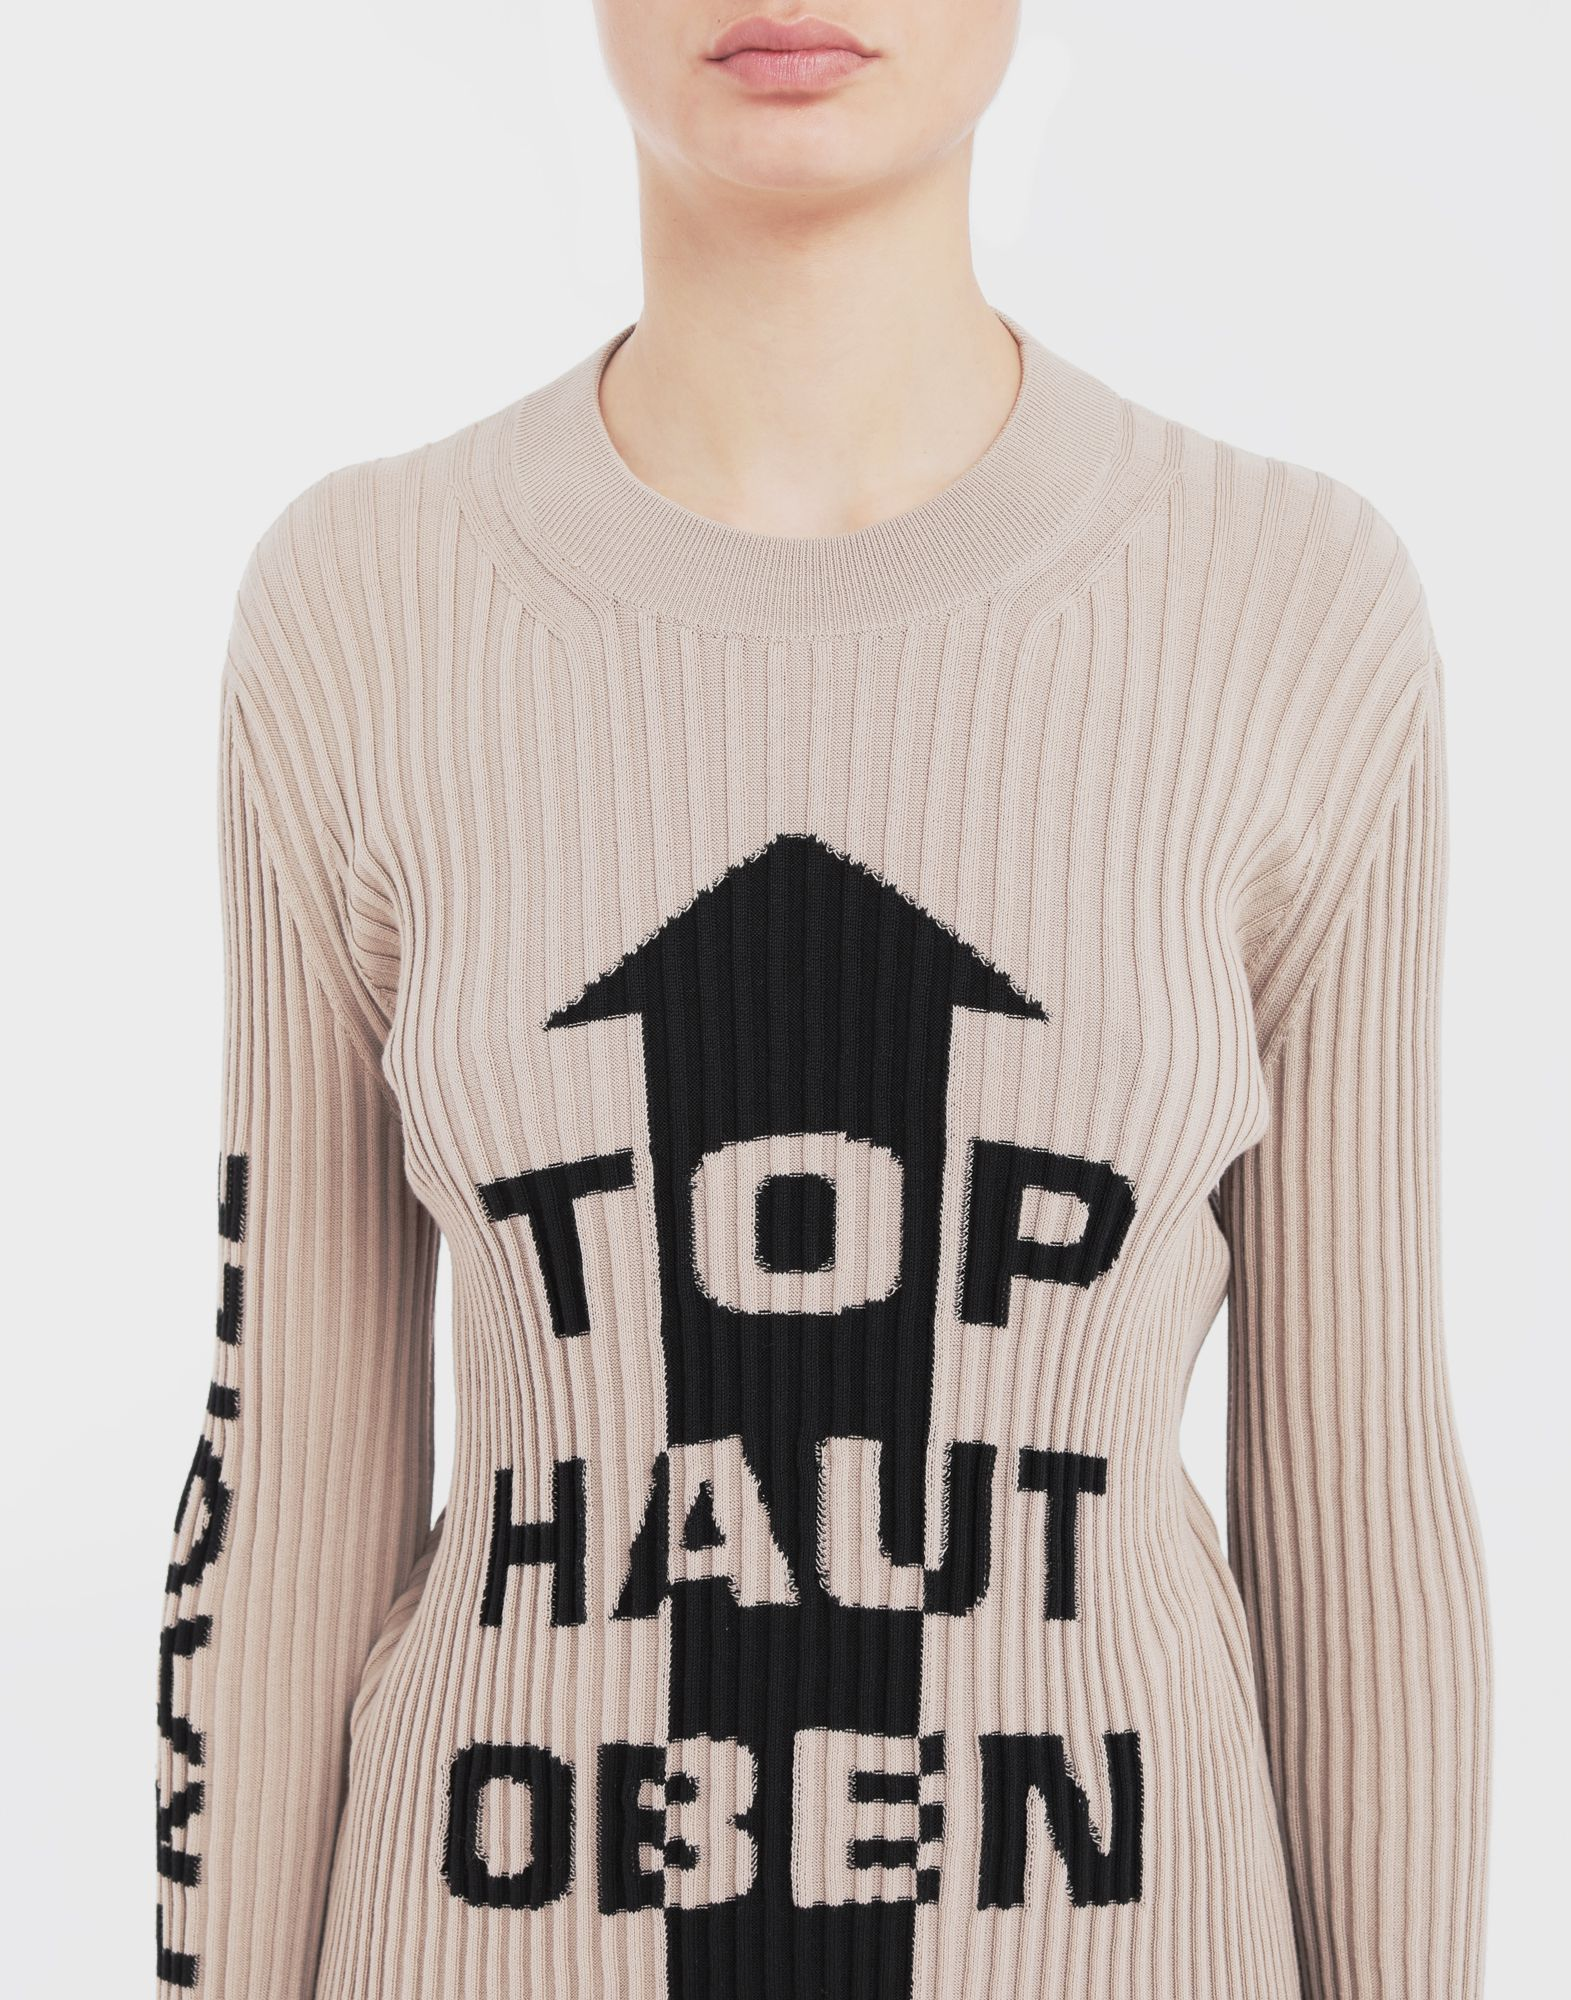 MAISON MARGIELA Ribs jumper in 'Carton' intarsia Long sleeve sweater Woman a